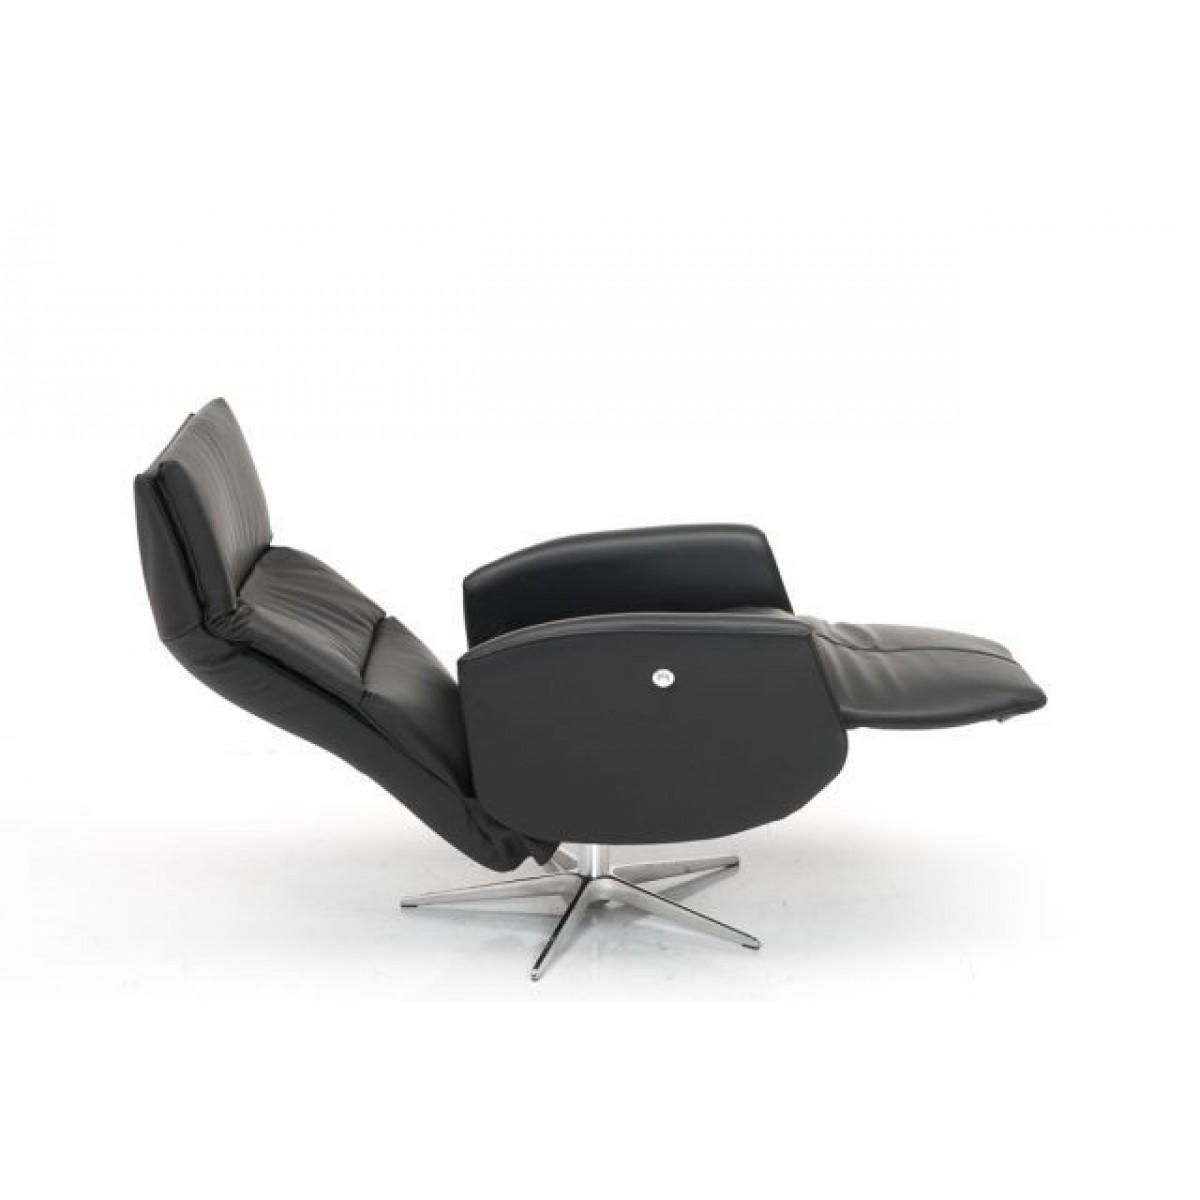 arne-5864-relax-fauteuil-stoel-leer-hjort-knudsen-miltonhouse